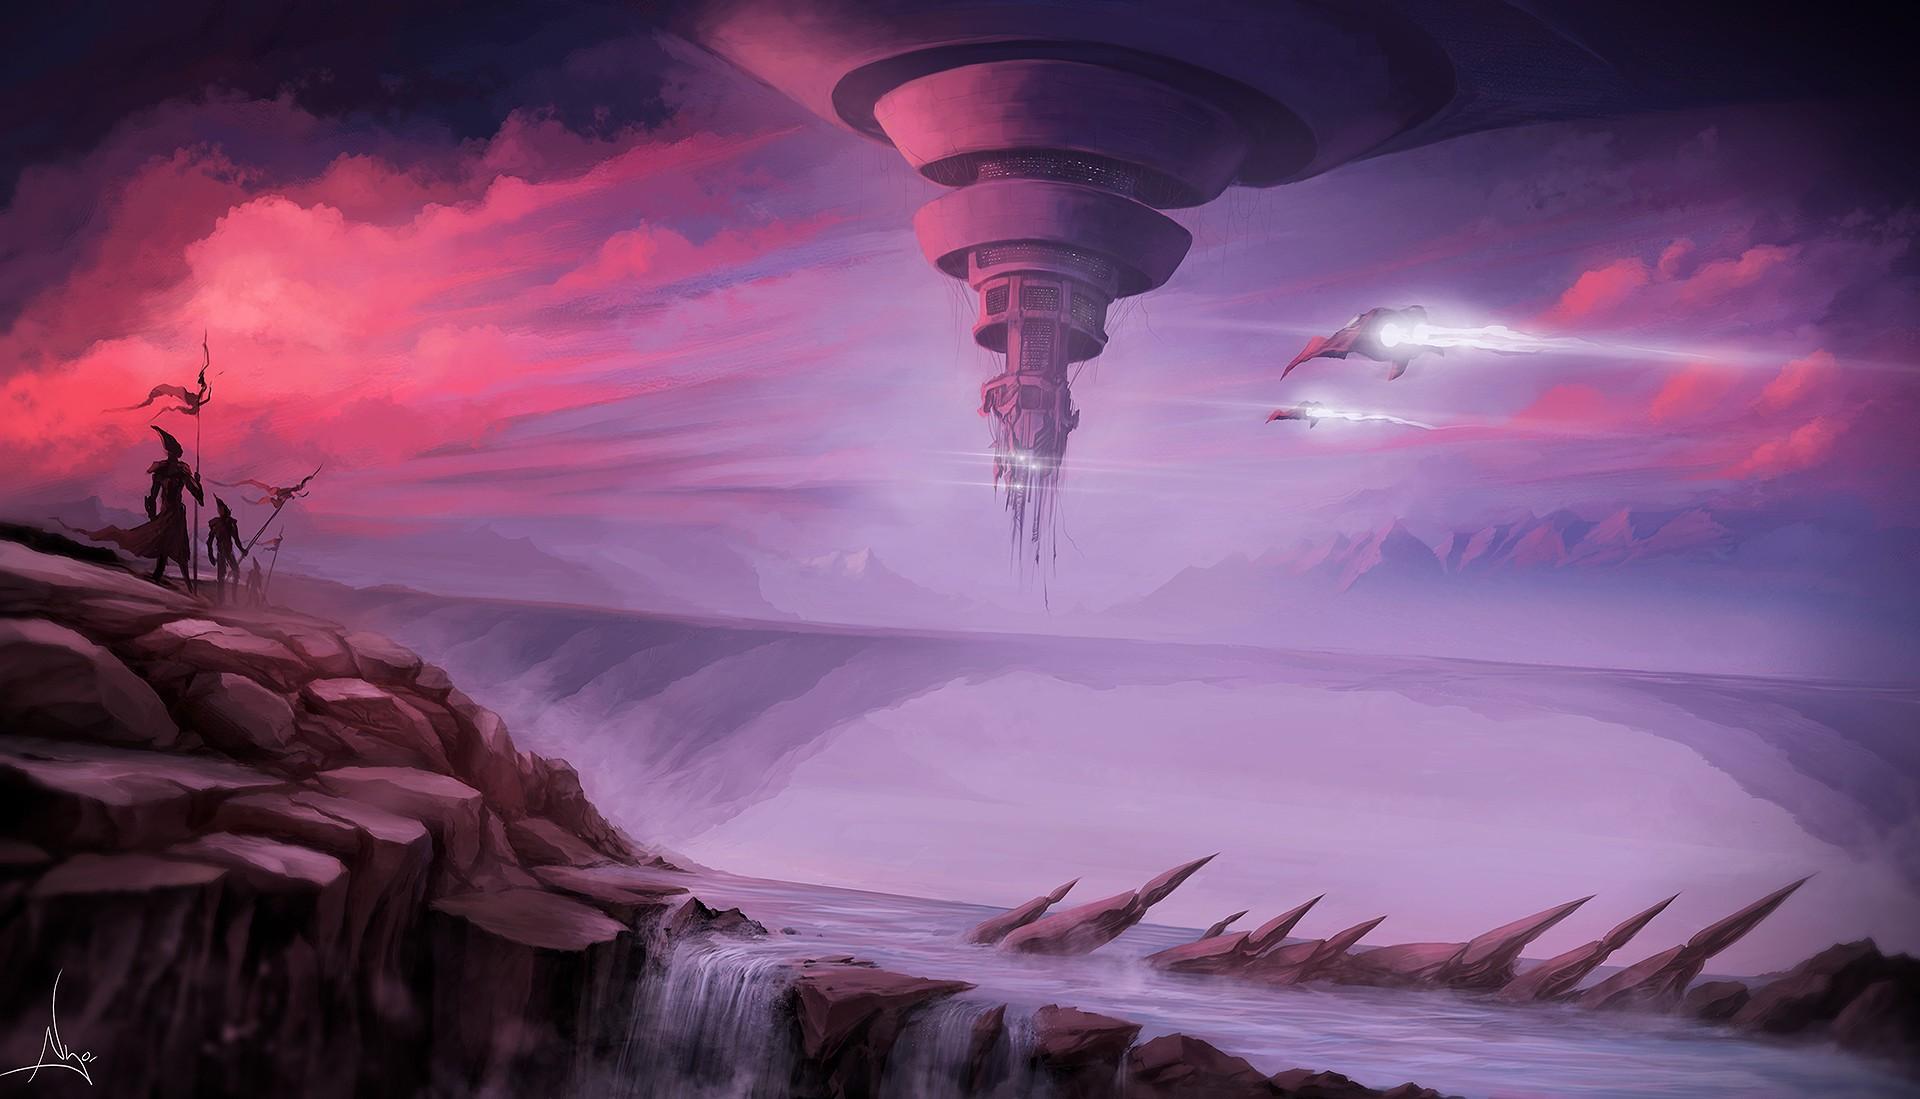 General 1920x1099 fantasy art spaceship futuristic waterfall aircraft river